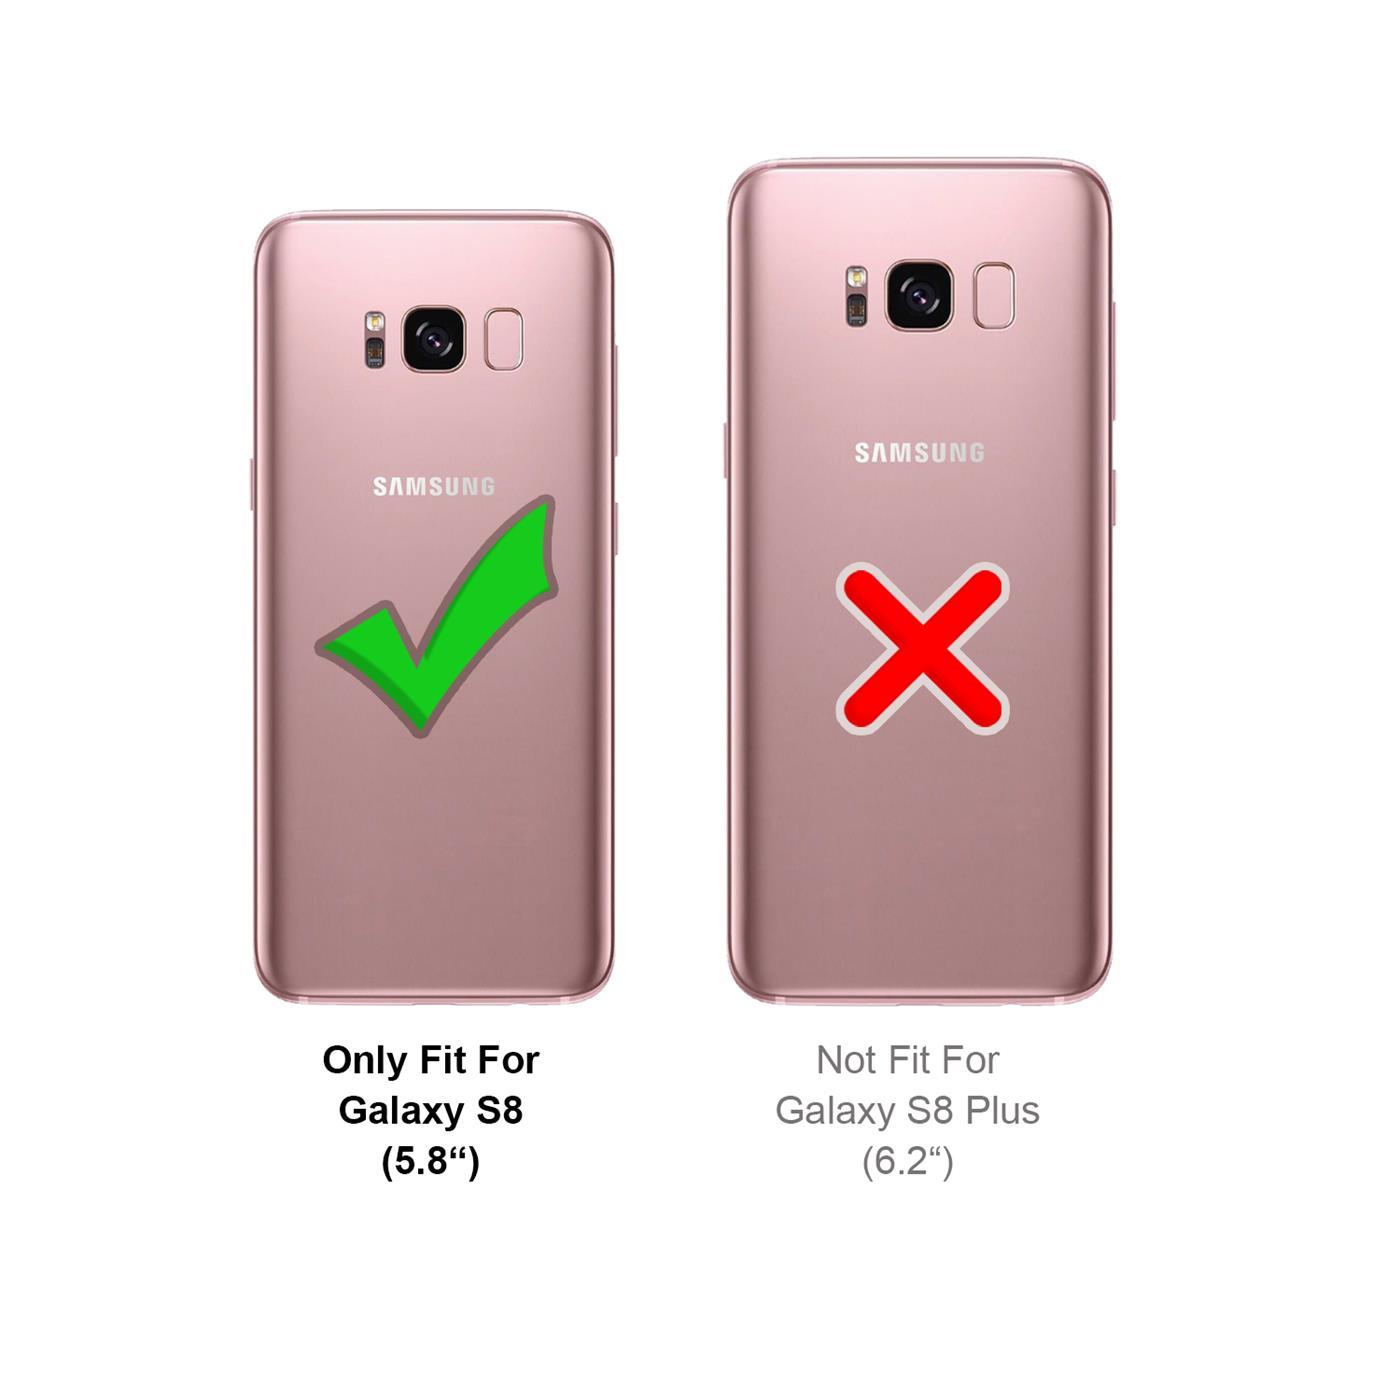 Hard-Back-Case-Cover-Samsung-Galaxy-s4-duenn-Cover-Slim-Shockproof-Rugged Indexbild 15